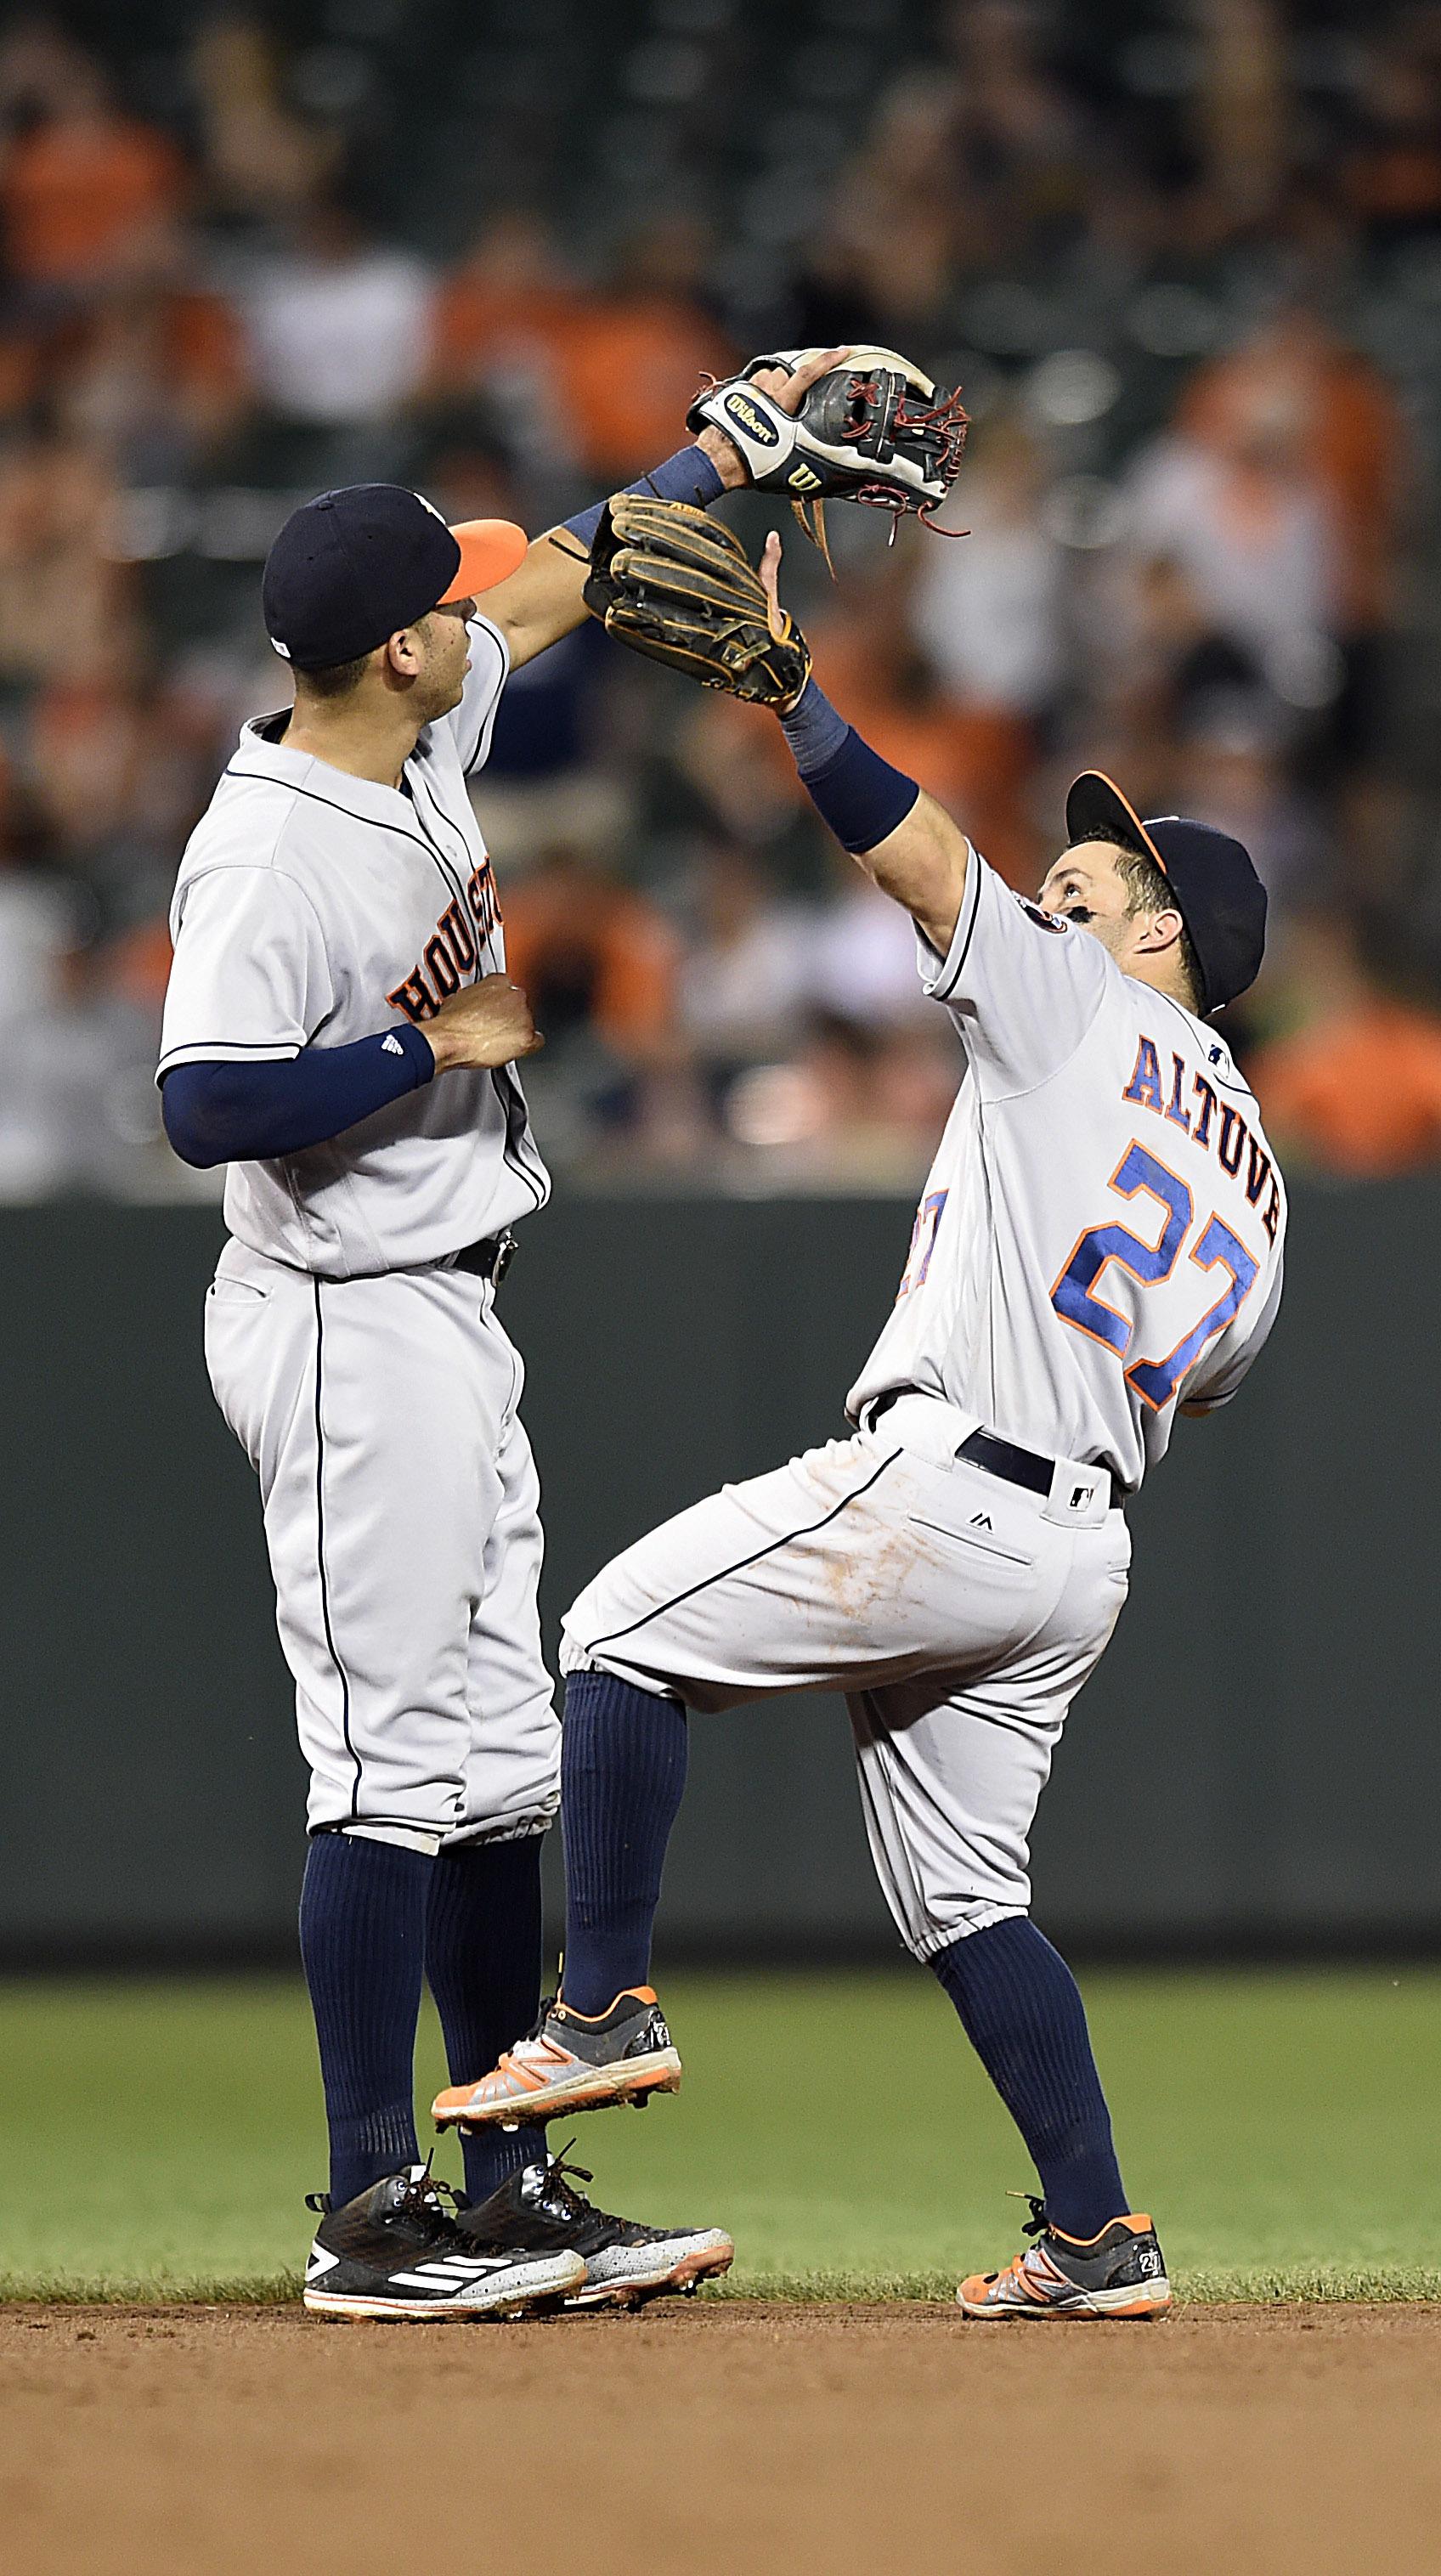 Houston Astros' Carlos Correa, left, and Jose Altuve celebrate the Astros' 15-8 win over the Baltimore Orioles in a baseball game, Friday, Aug. 19, 2016, in Baltimore. (AP Photo/Gail Burton)